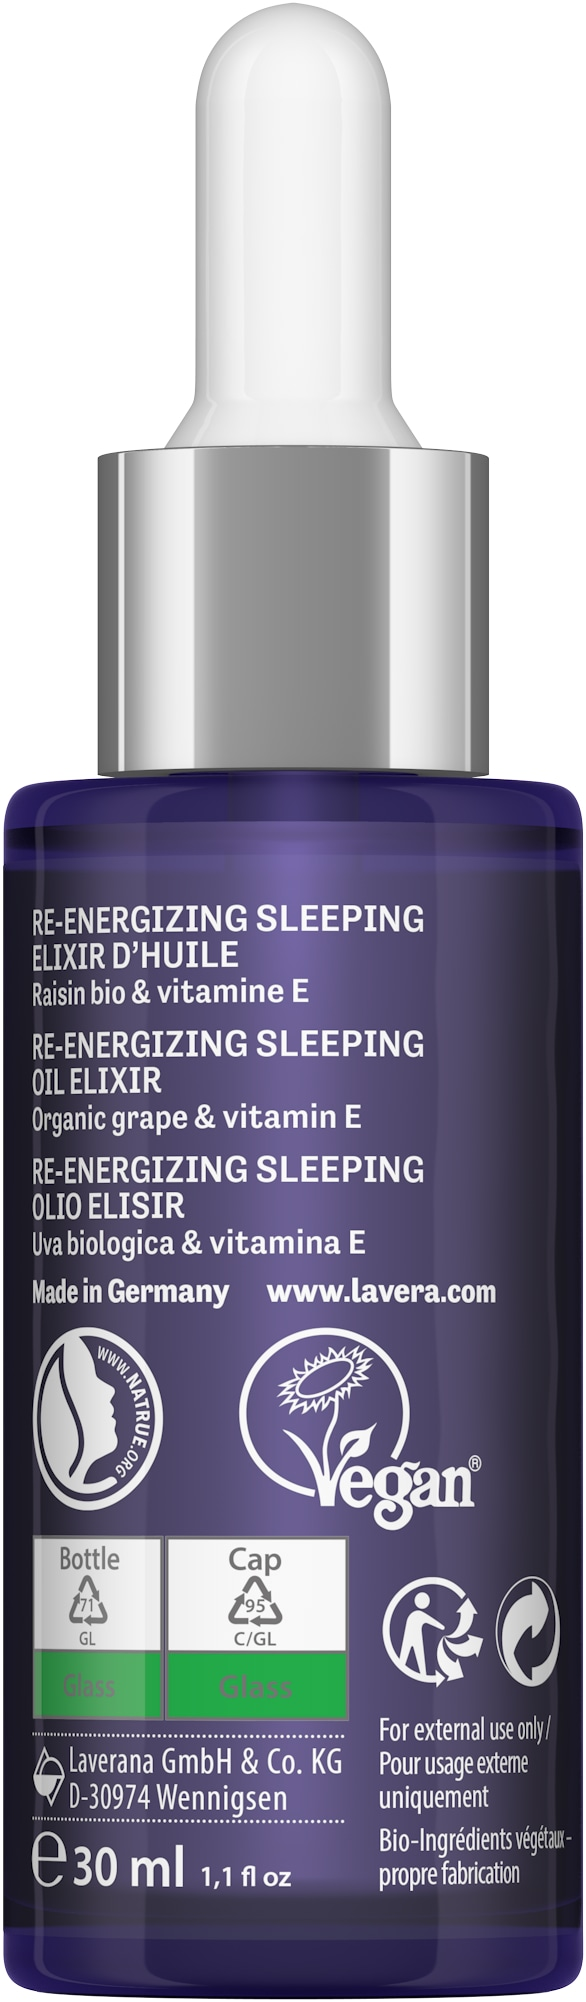 Re-Energizing Sleeping Öl-Elixier